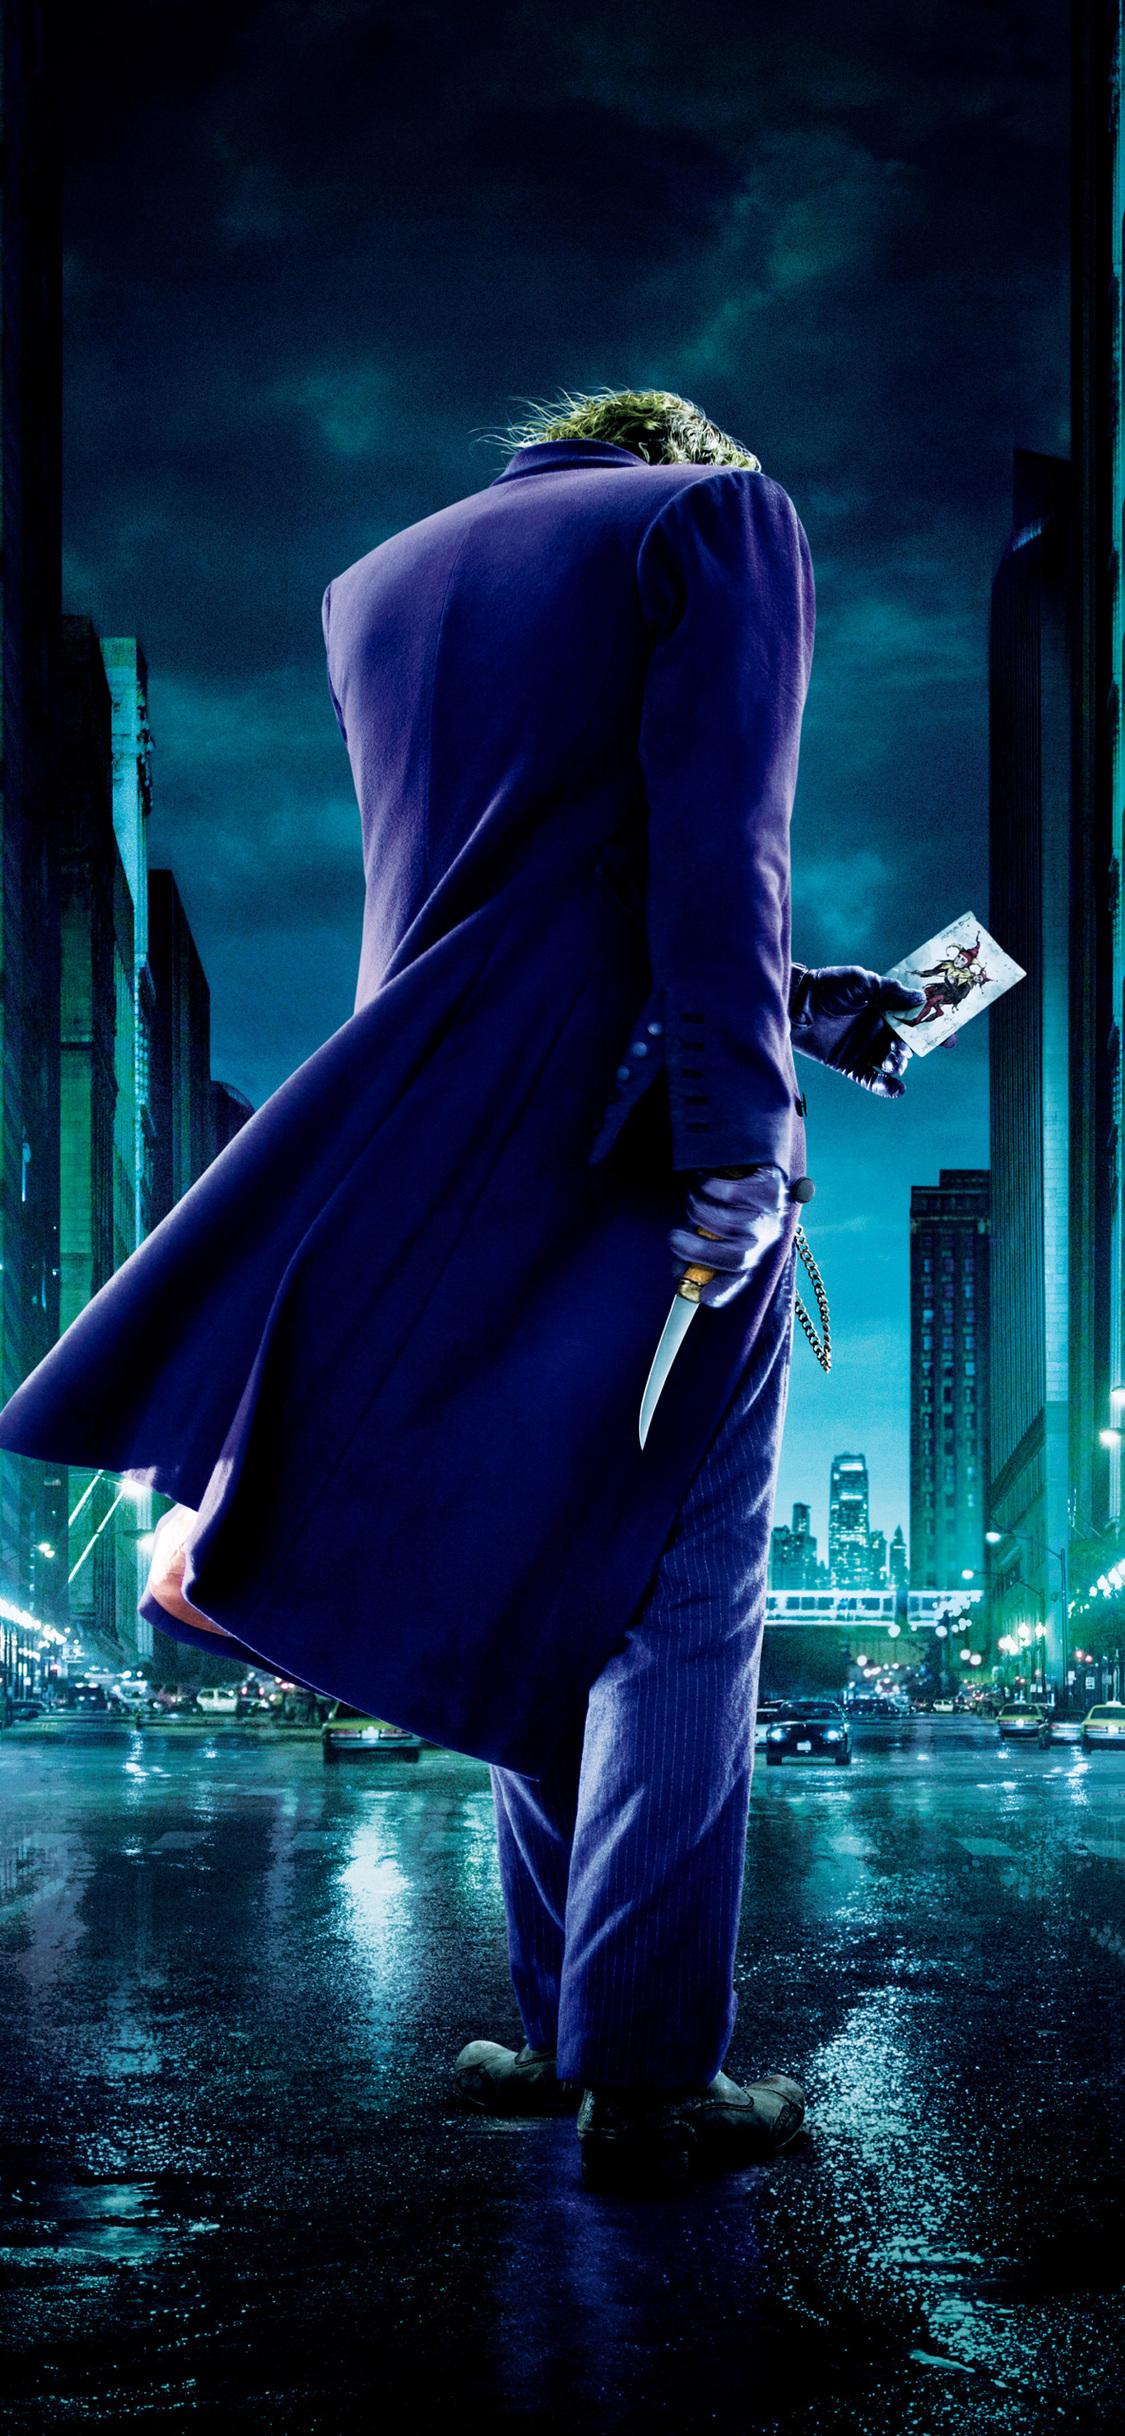 1125x2436 Joker The Dark Knight 4k Iphone Xs Iphone 10 Iphone X Hd